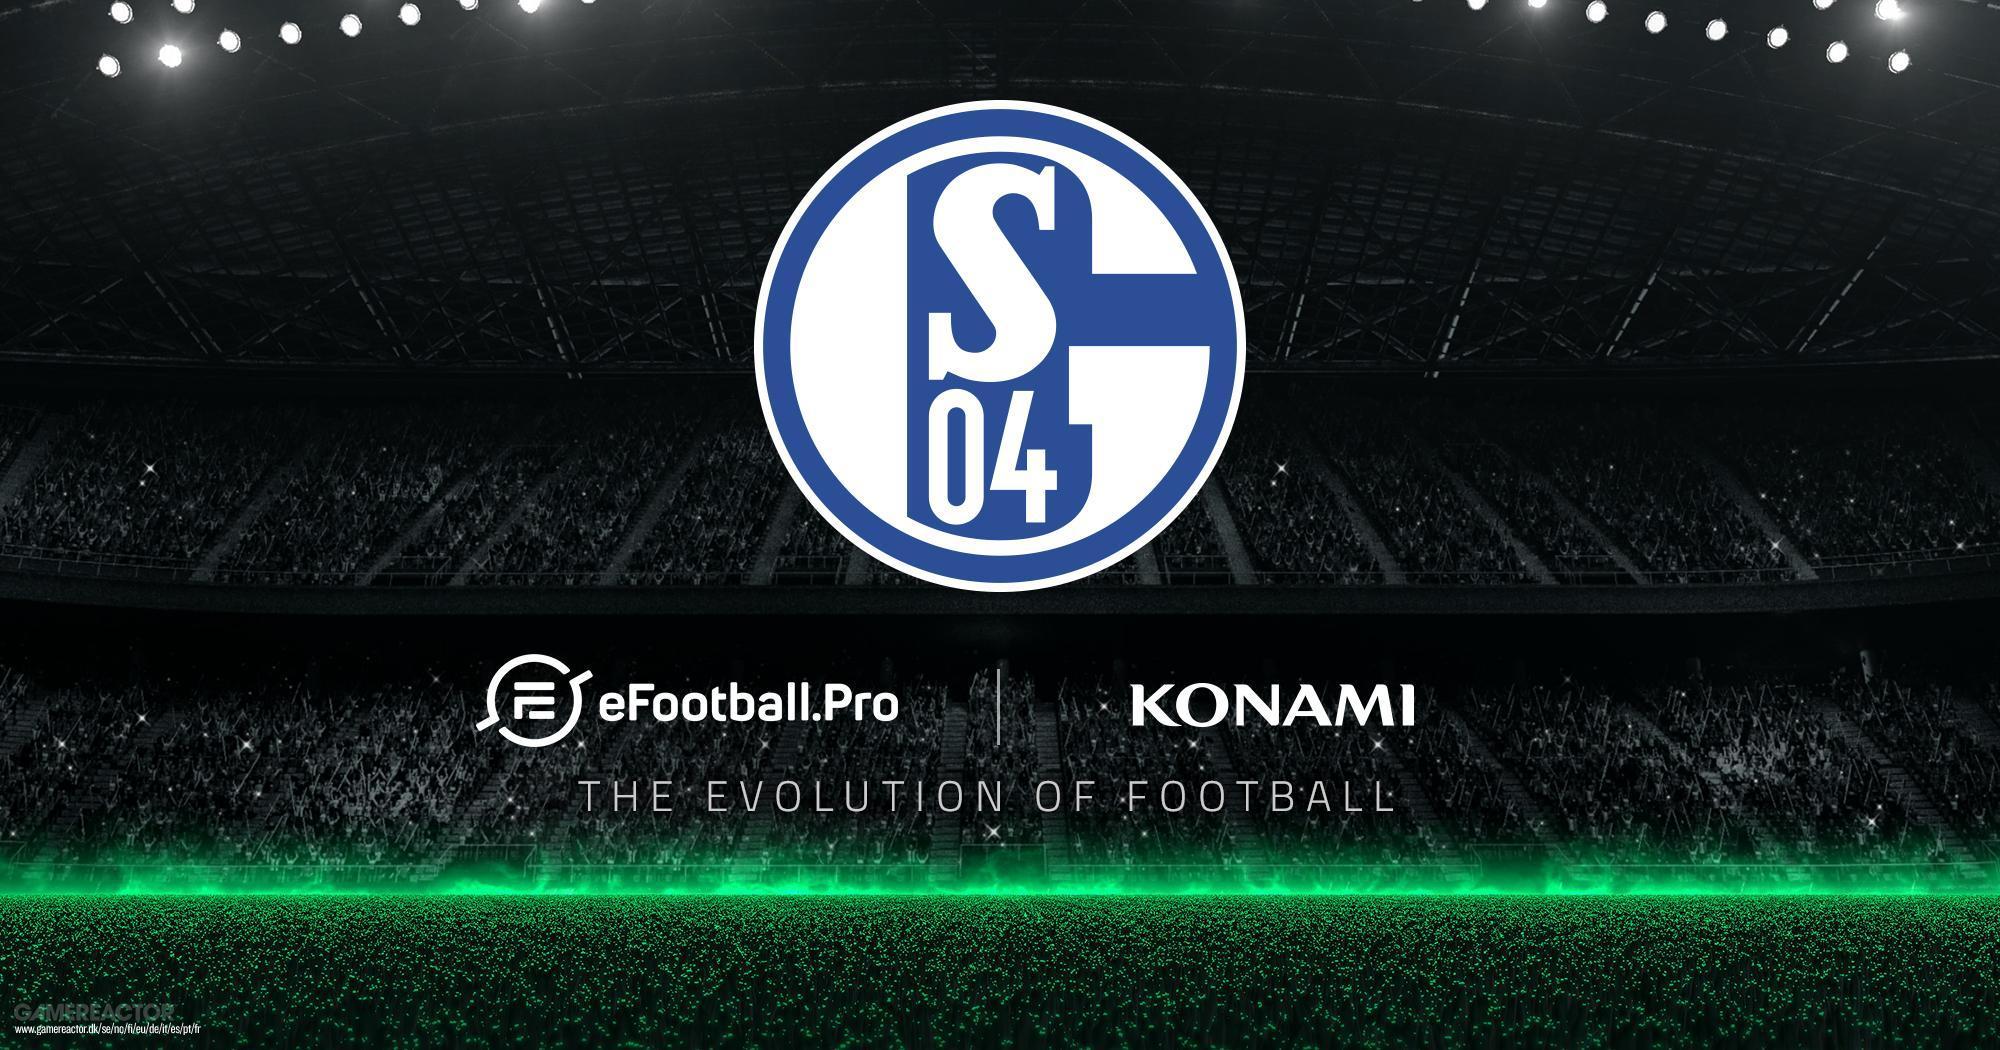 Schalke 04 Esports Joins Pes 2019 Efootball Pro League Pro Evolution Soccer 2019 Gamereactor